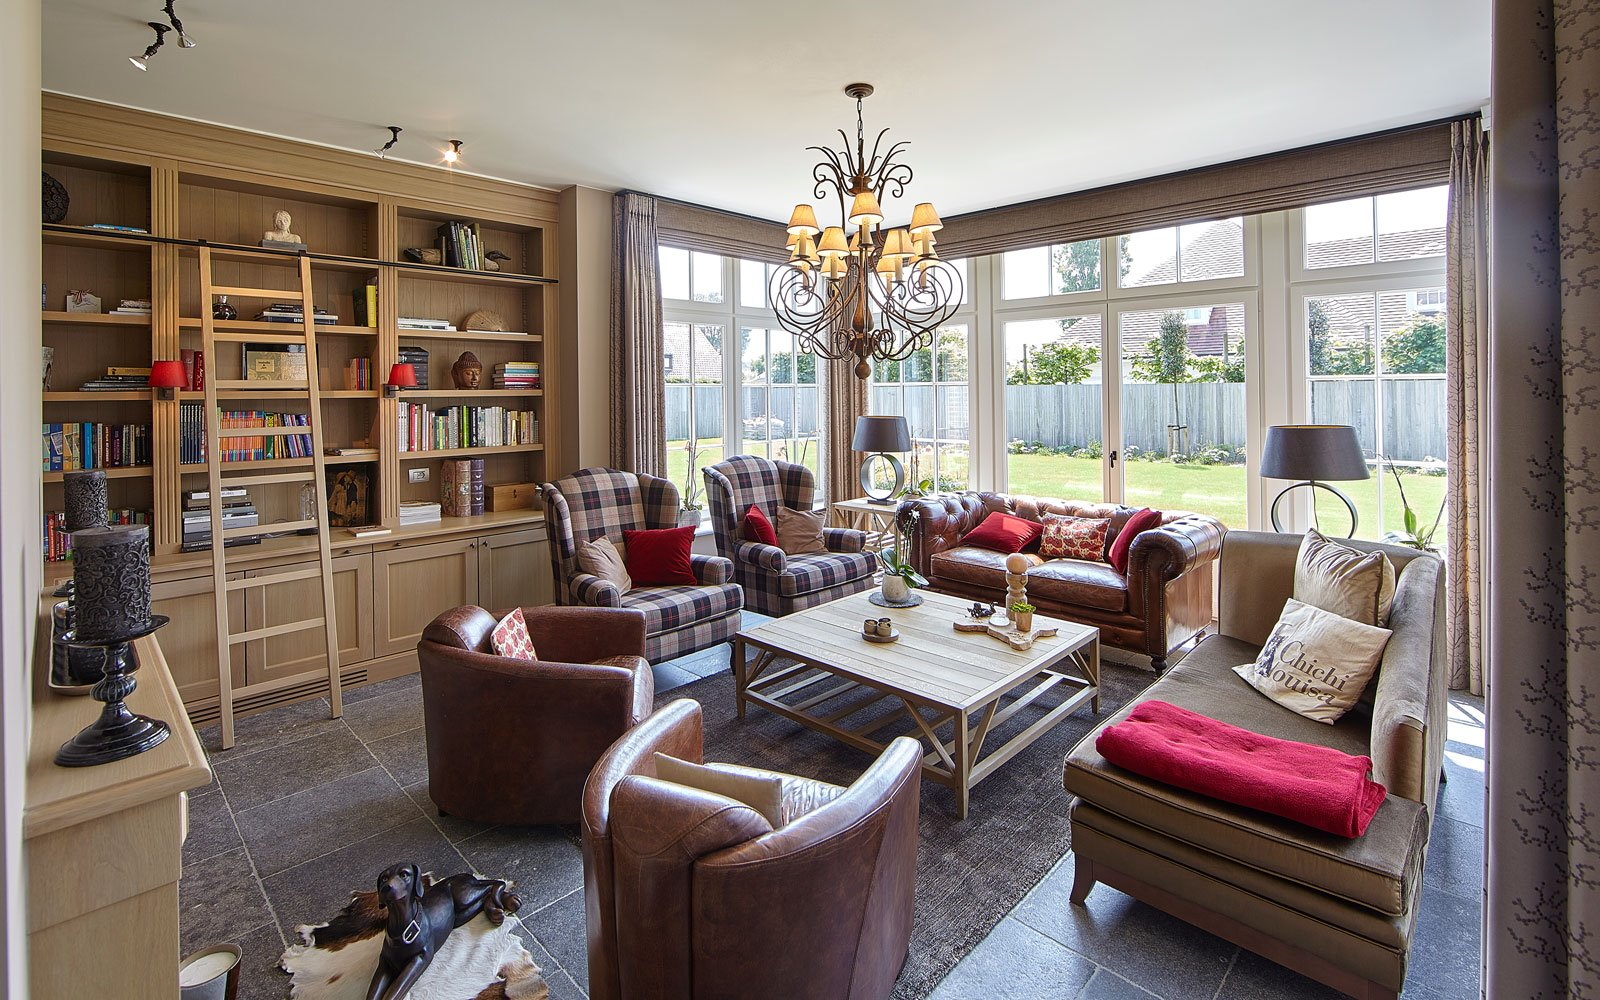 Loungehoek, Chesterfield, boekenkast, comfortabel interieur, Engelse cottage, Bart François